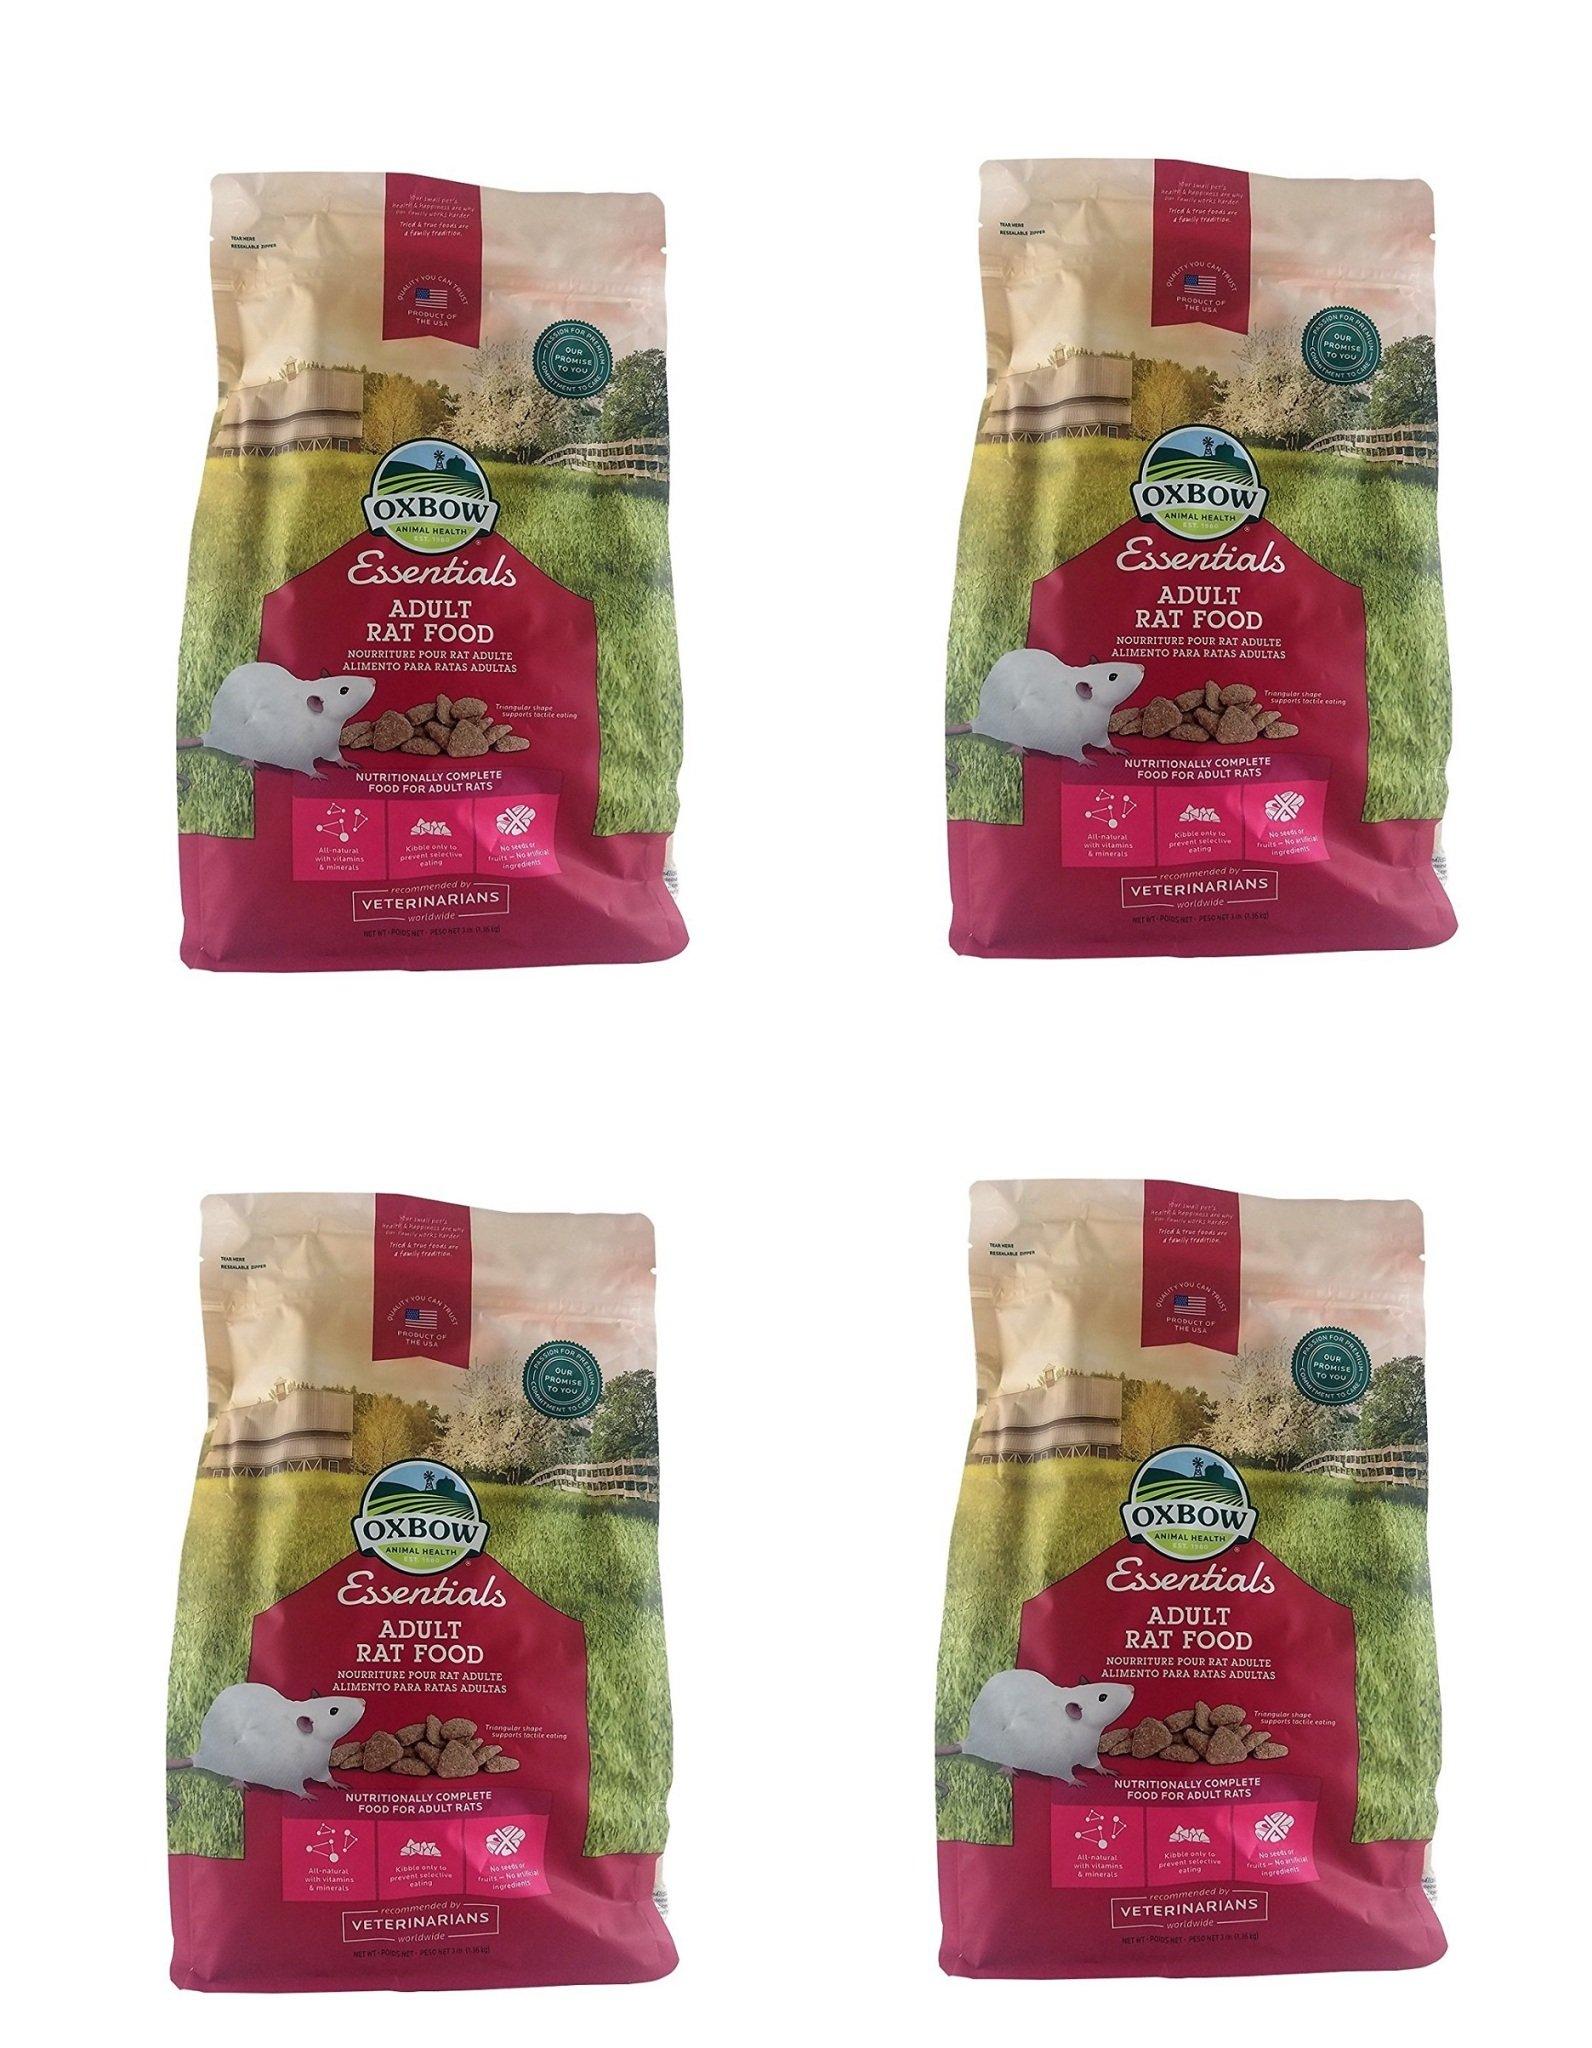 Oxbow Essentials Adult Rat Food kCVMrG, 12 Pounds